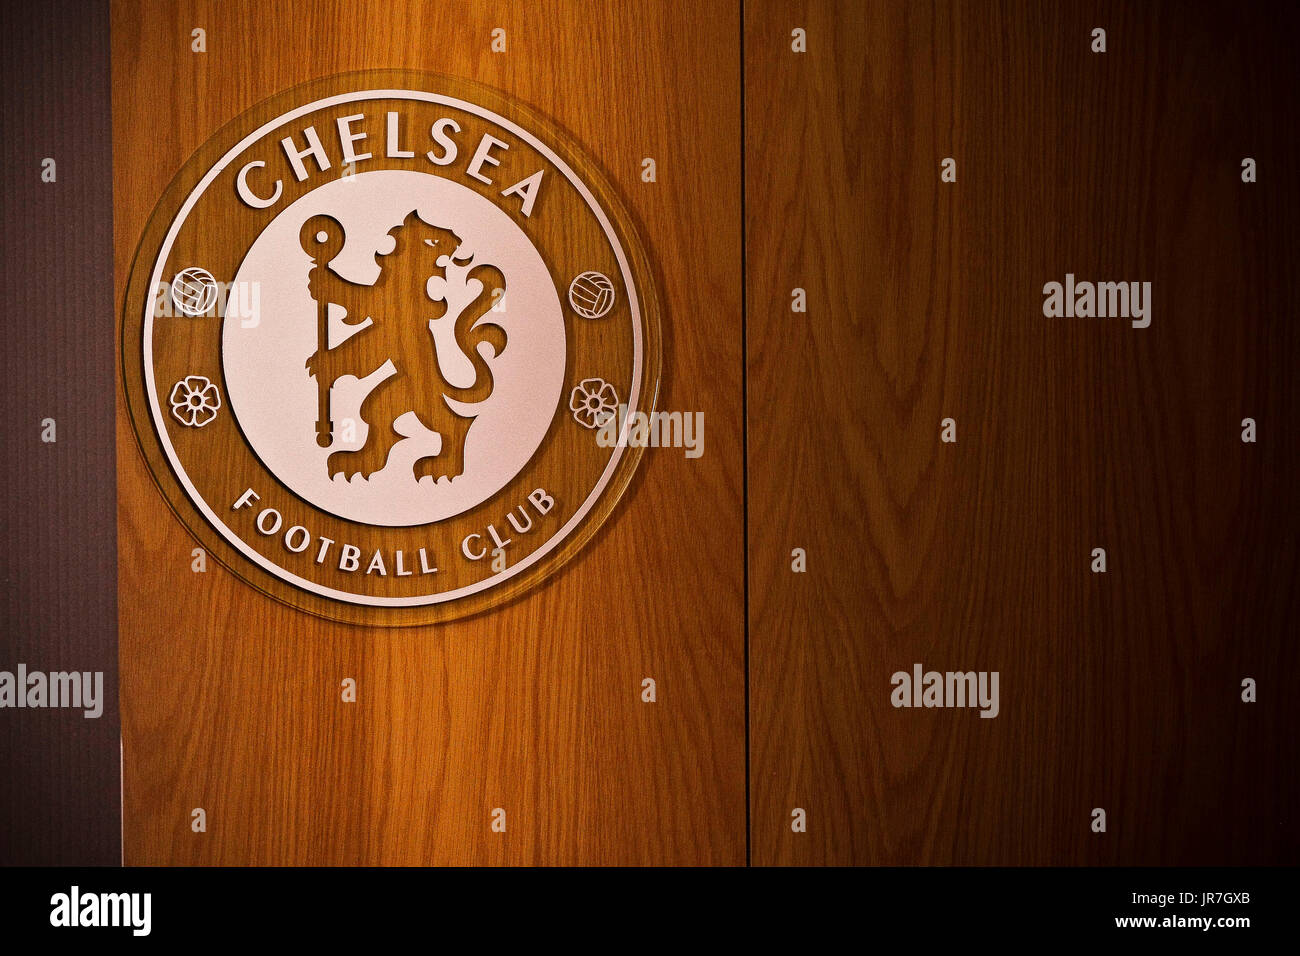 Cobham, Surrey, UK 4th August,2017  Chelsea logo  at Chelsea's training facility - Stock Image